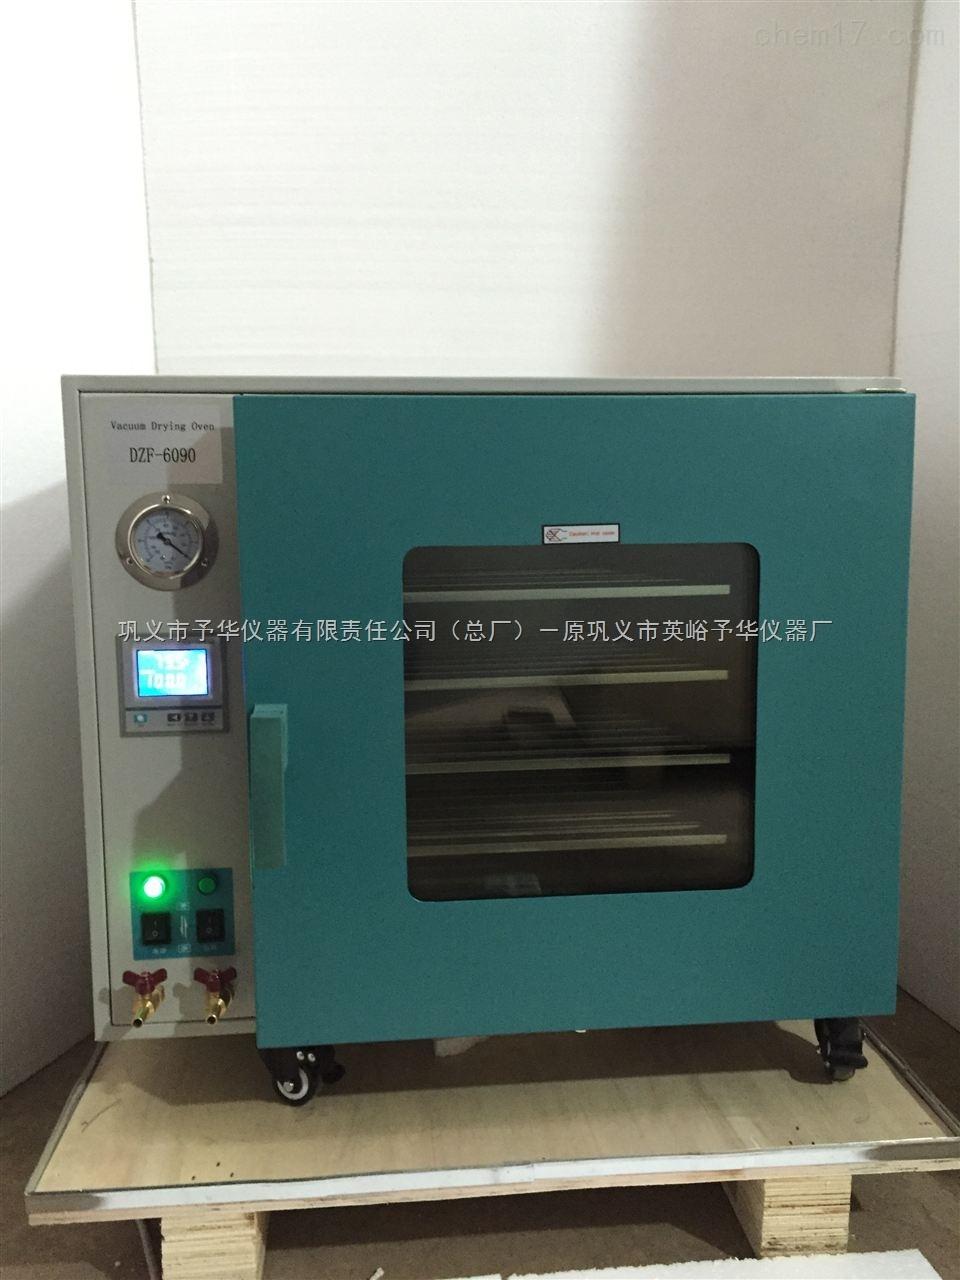 DZF系列真空干燥箱-巩义市予华仪器有限责任公司优质生产厂家